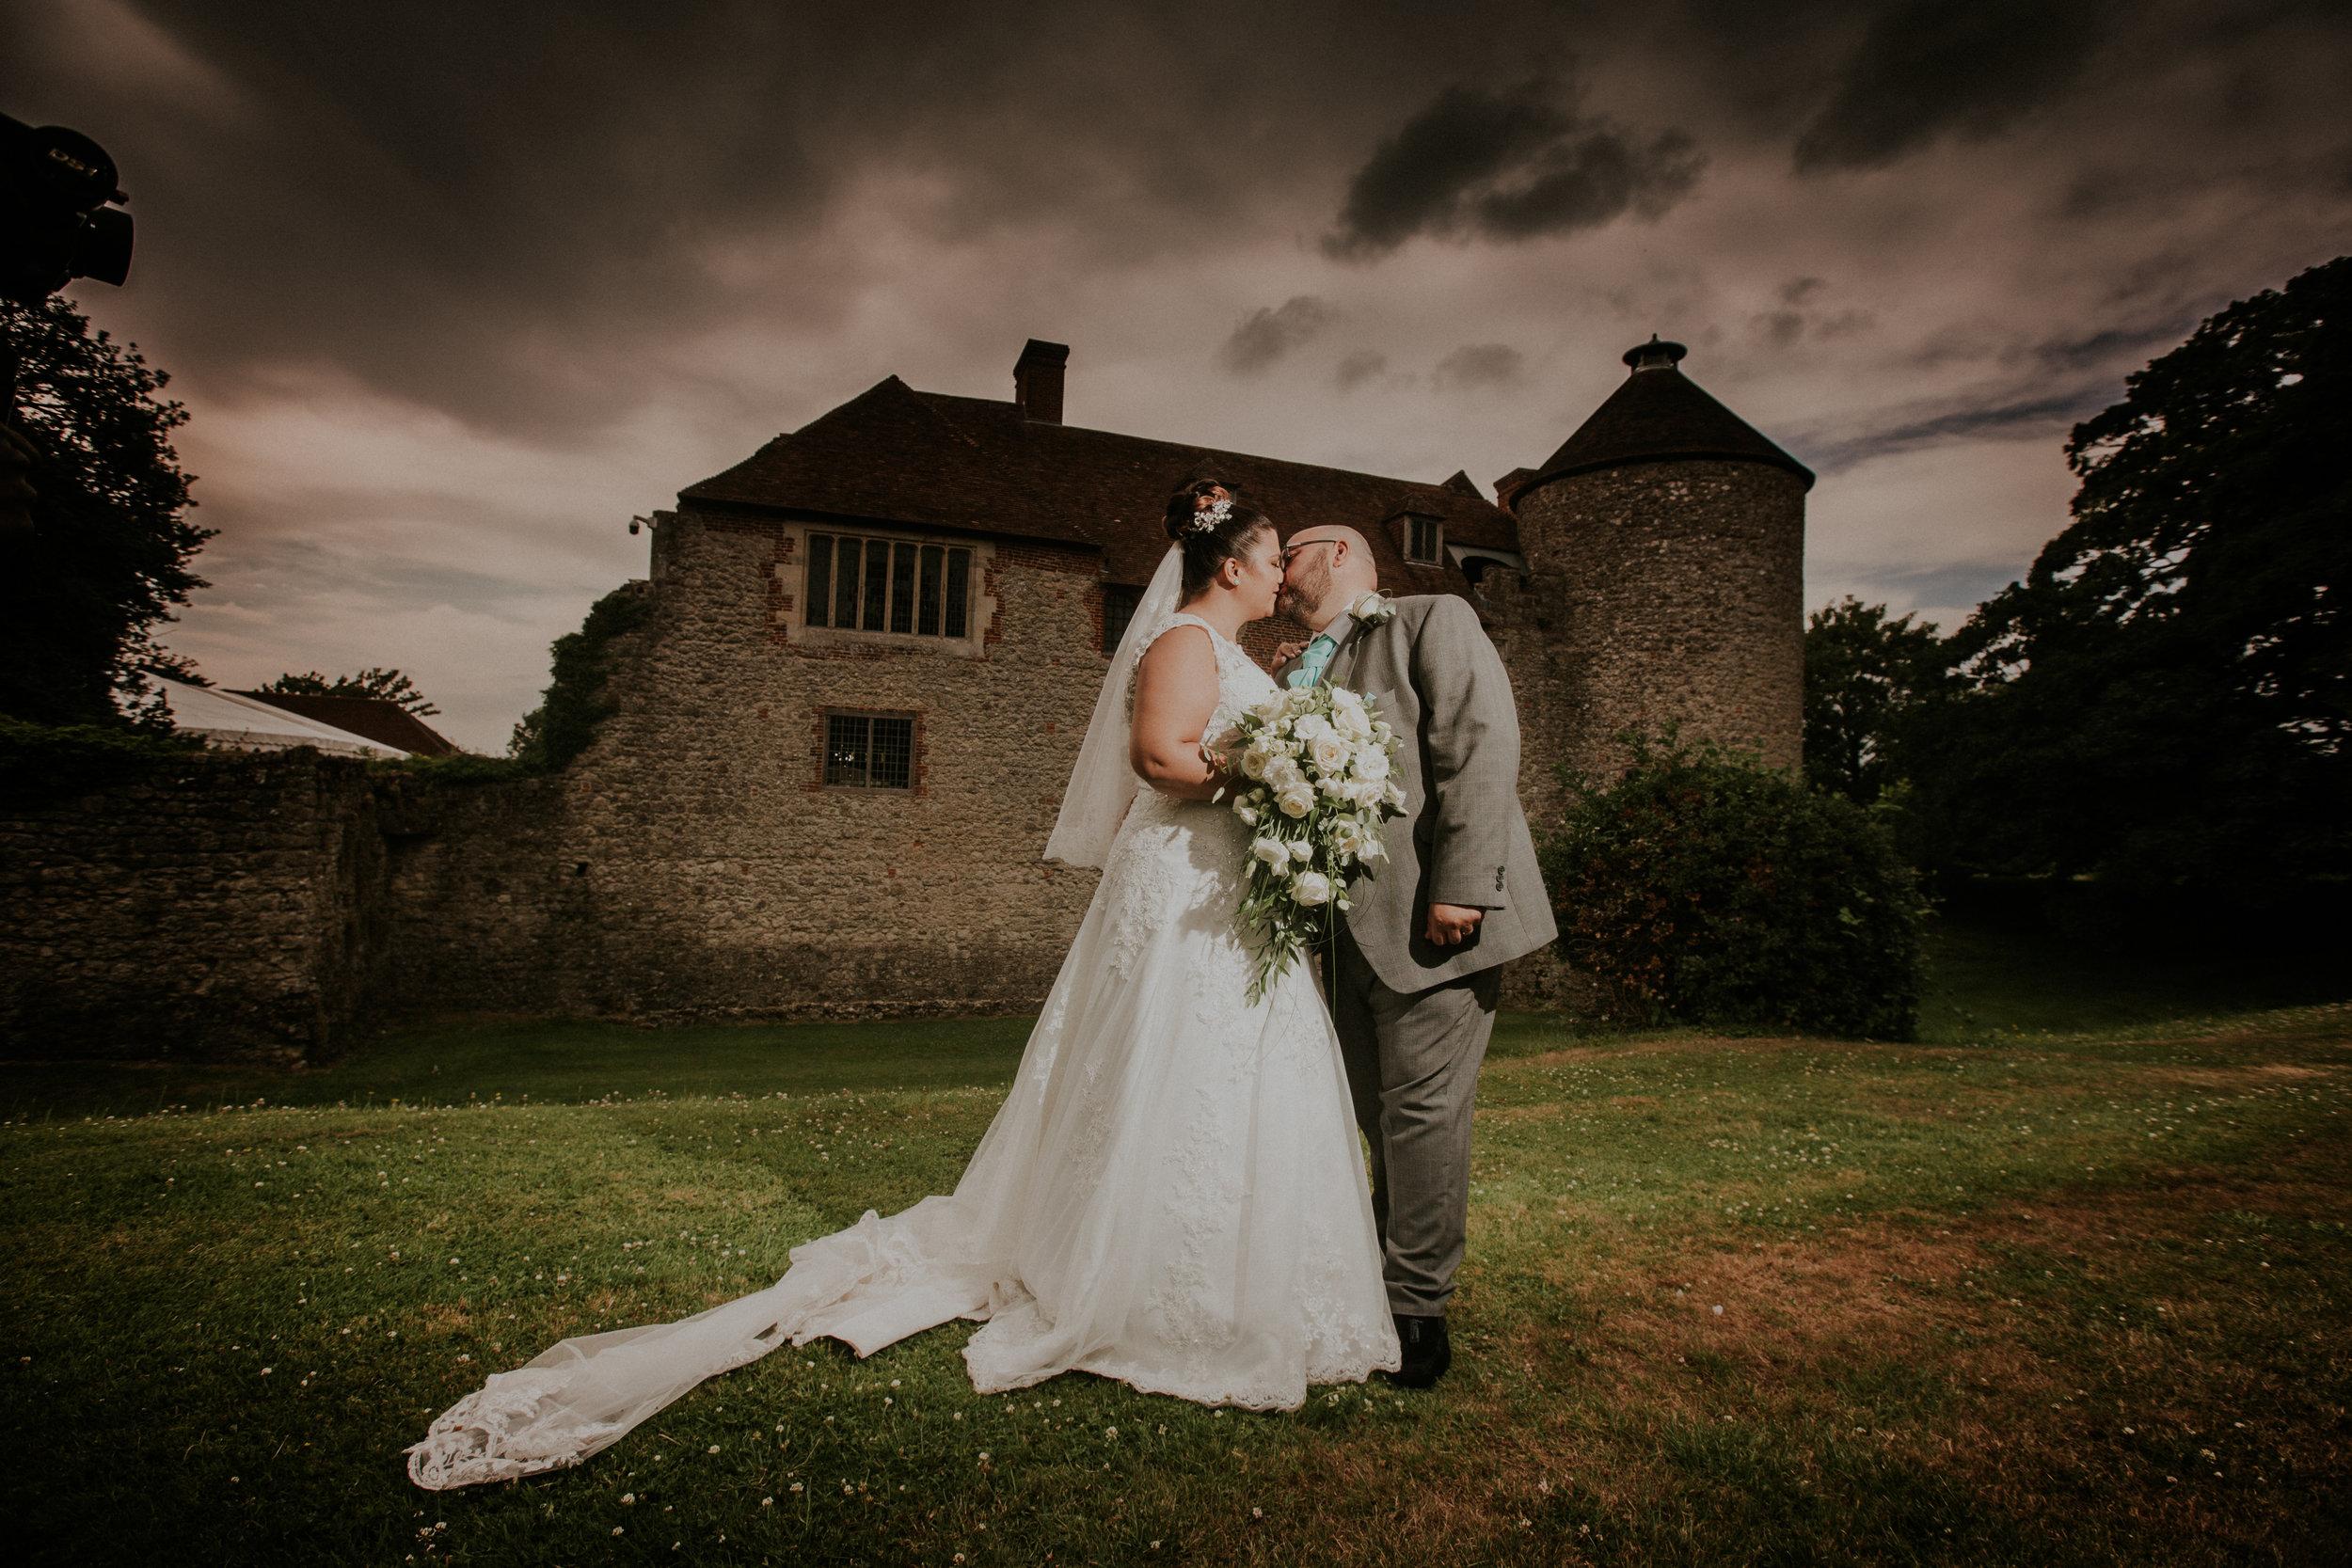 westenhangar-castle-kent-london-wedding-photography-portrait-55